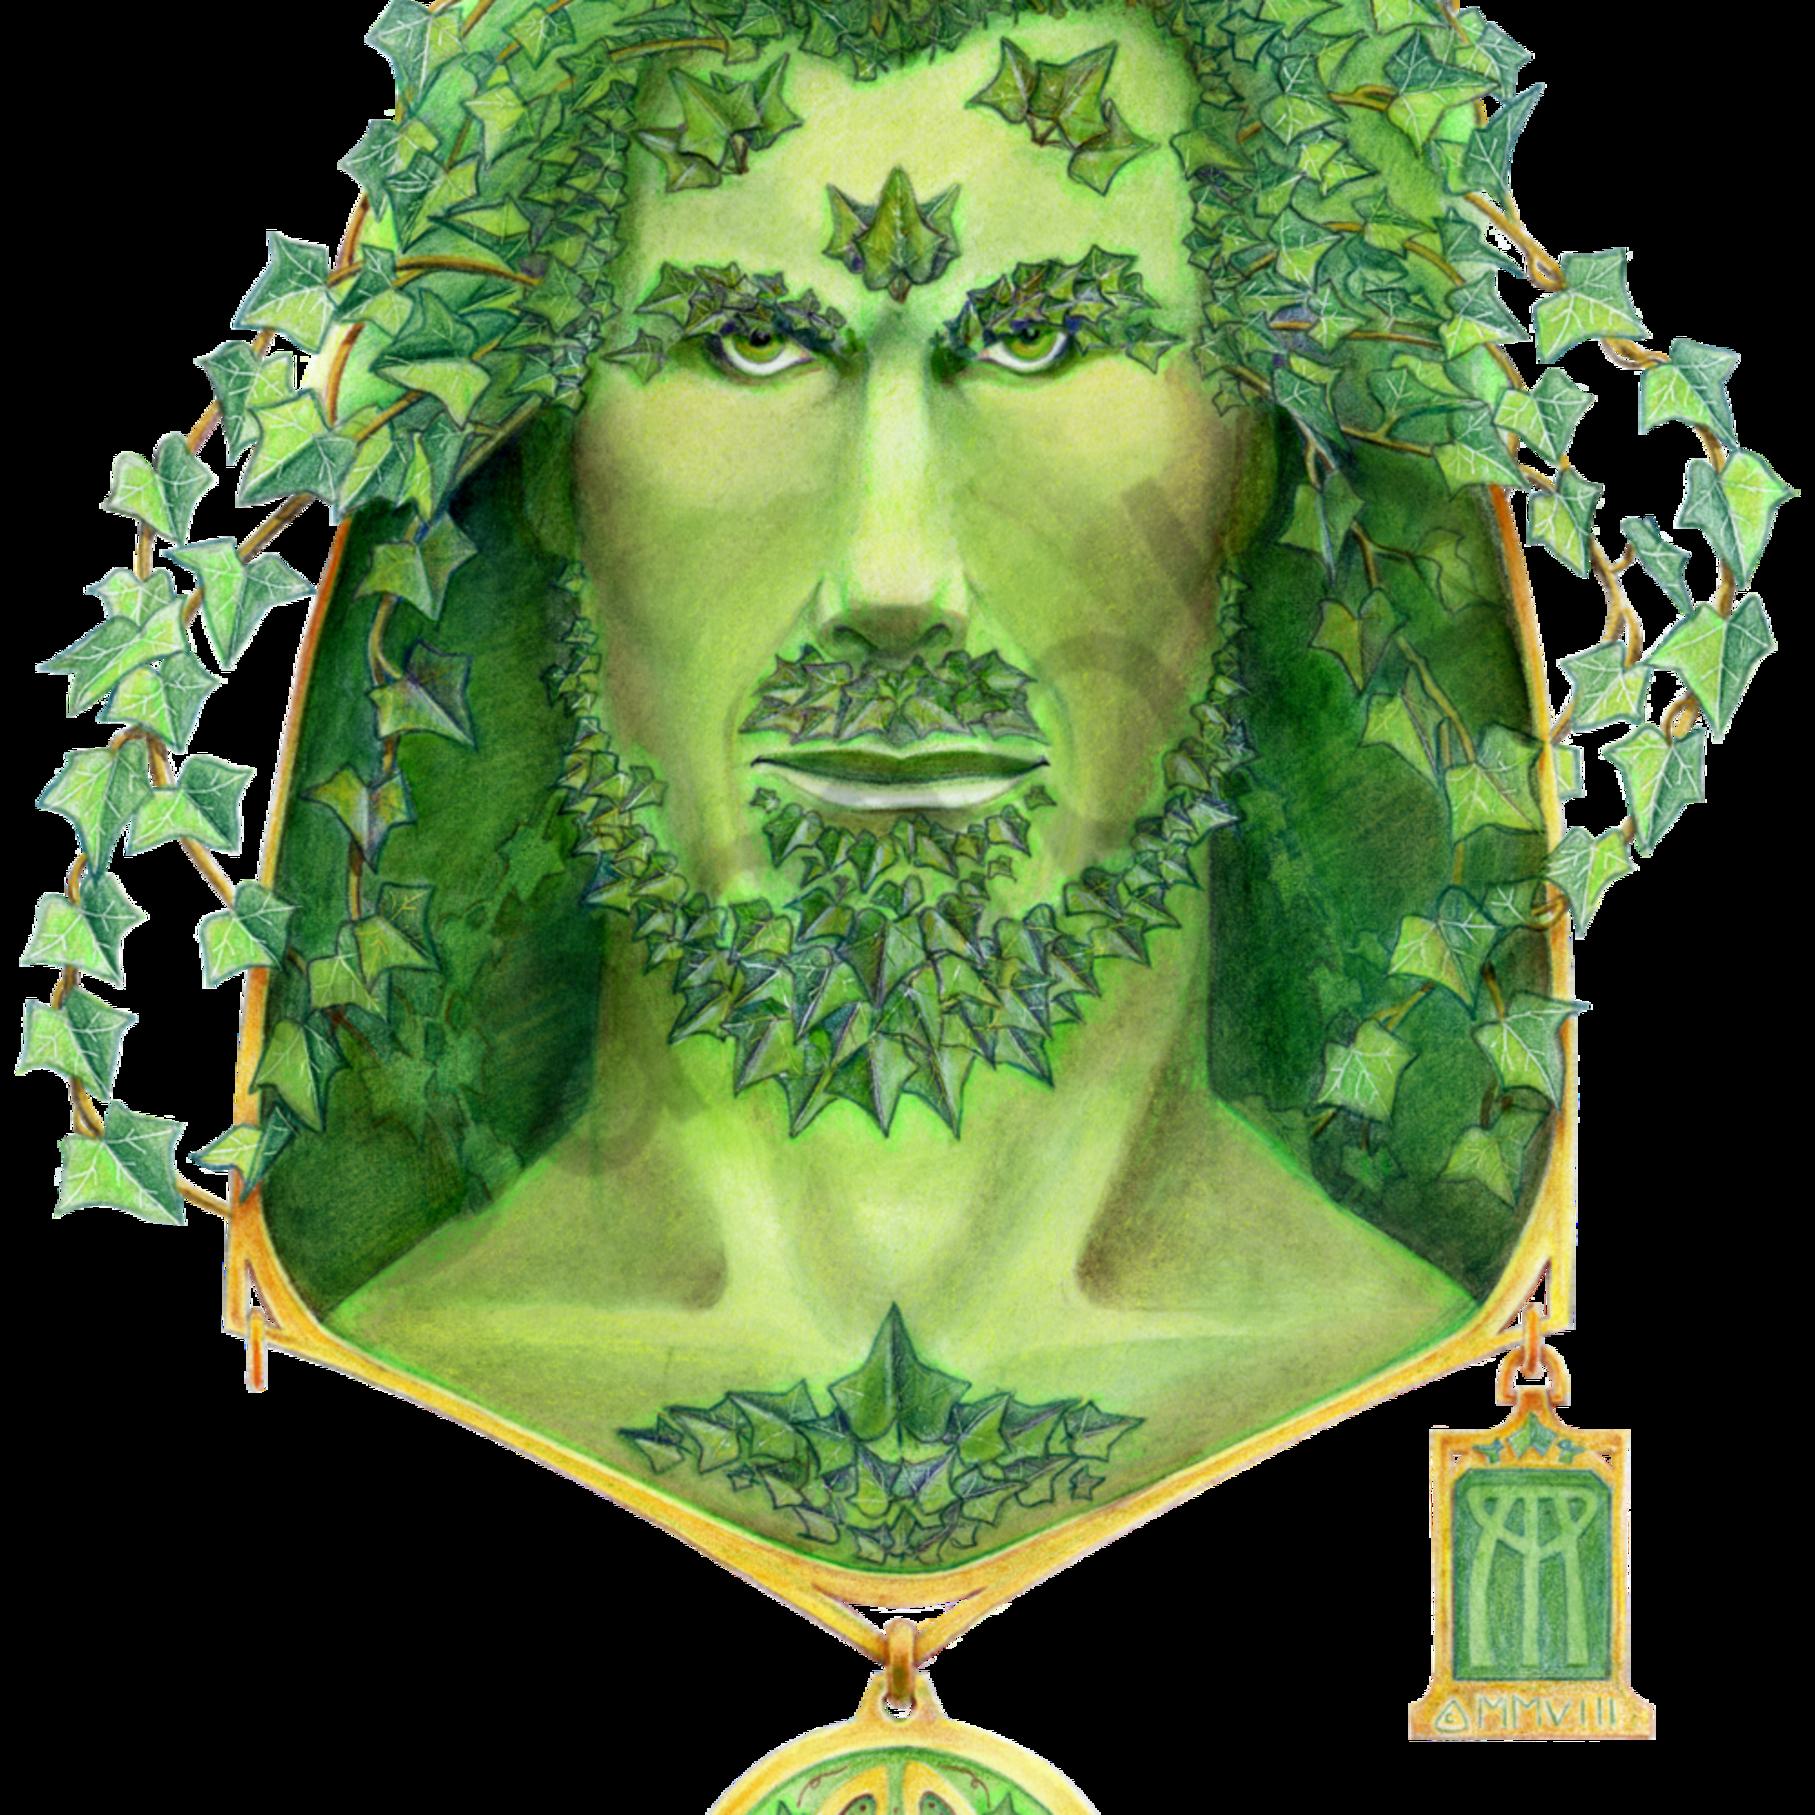 Green man ivy vds3ms